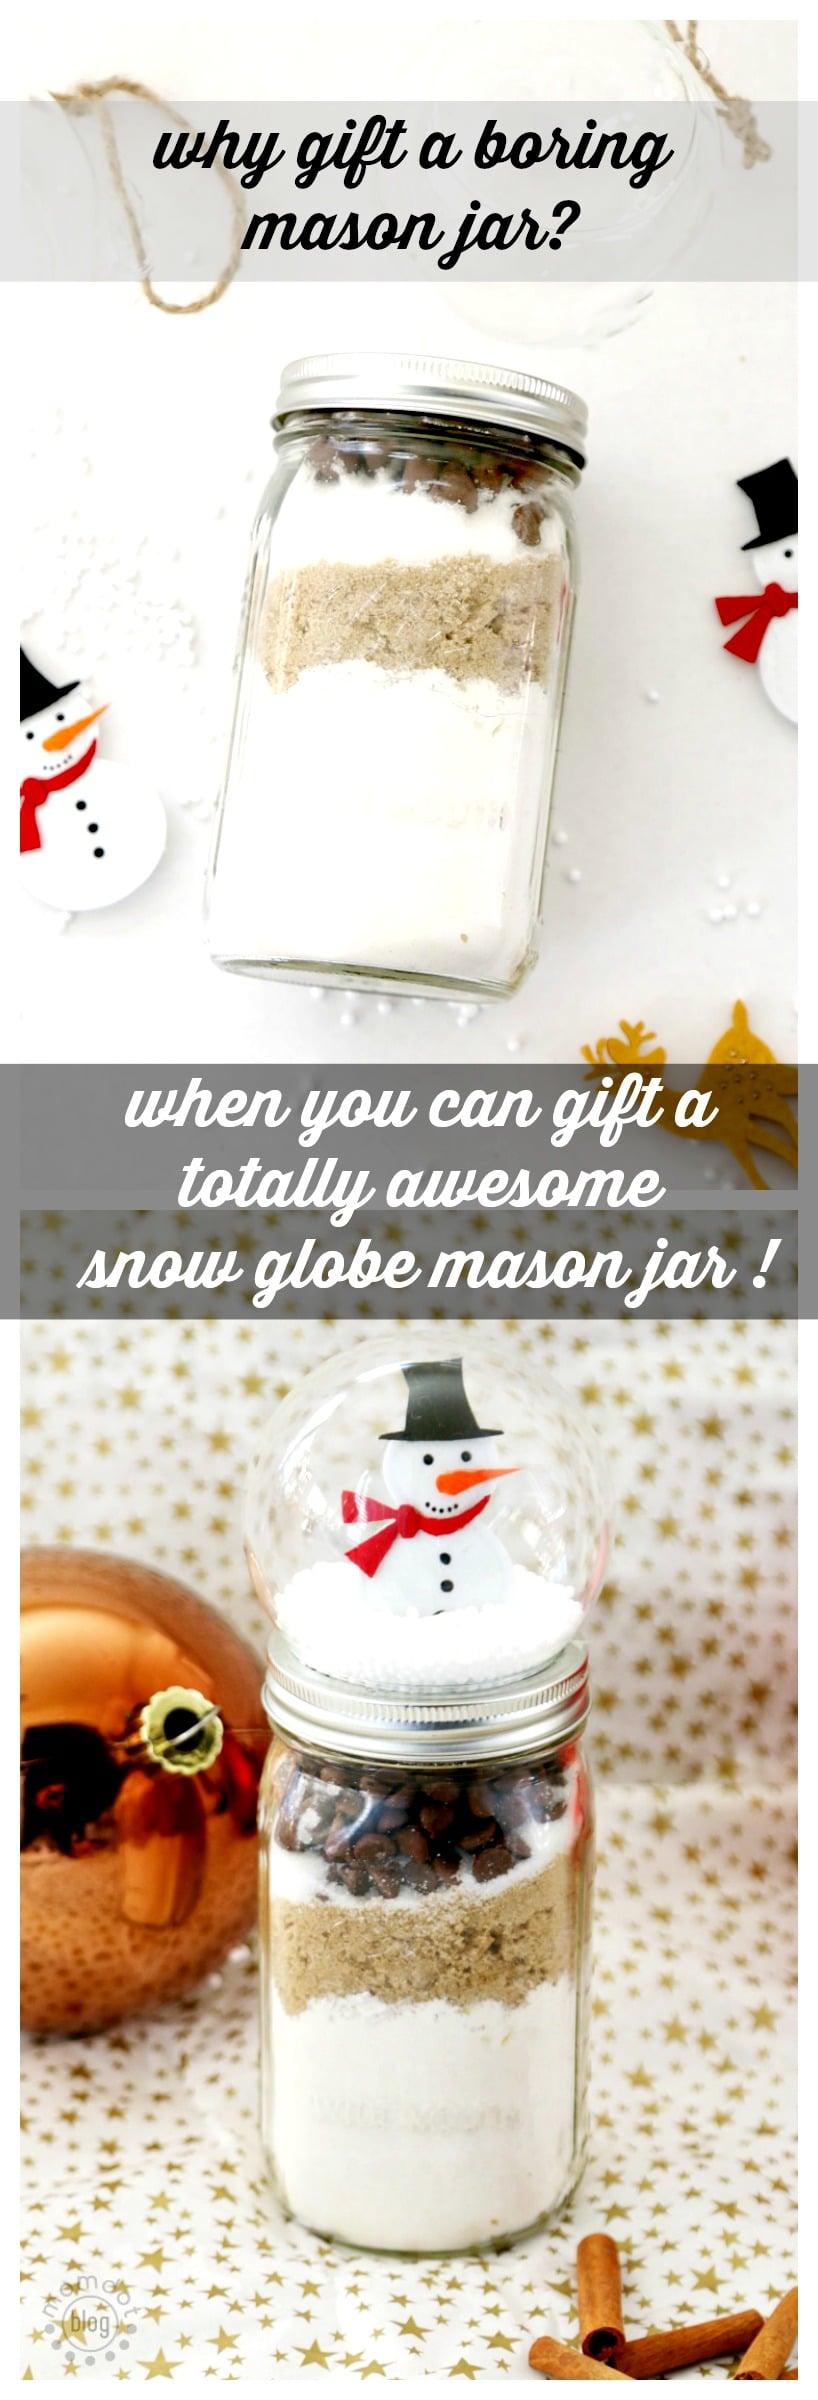 Mason Jar Gift? NO. Snow Globe Mason Jar Gift. BETTER. Easy DIY to upsell that gift